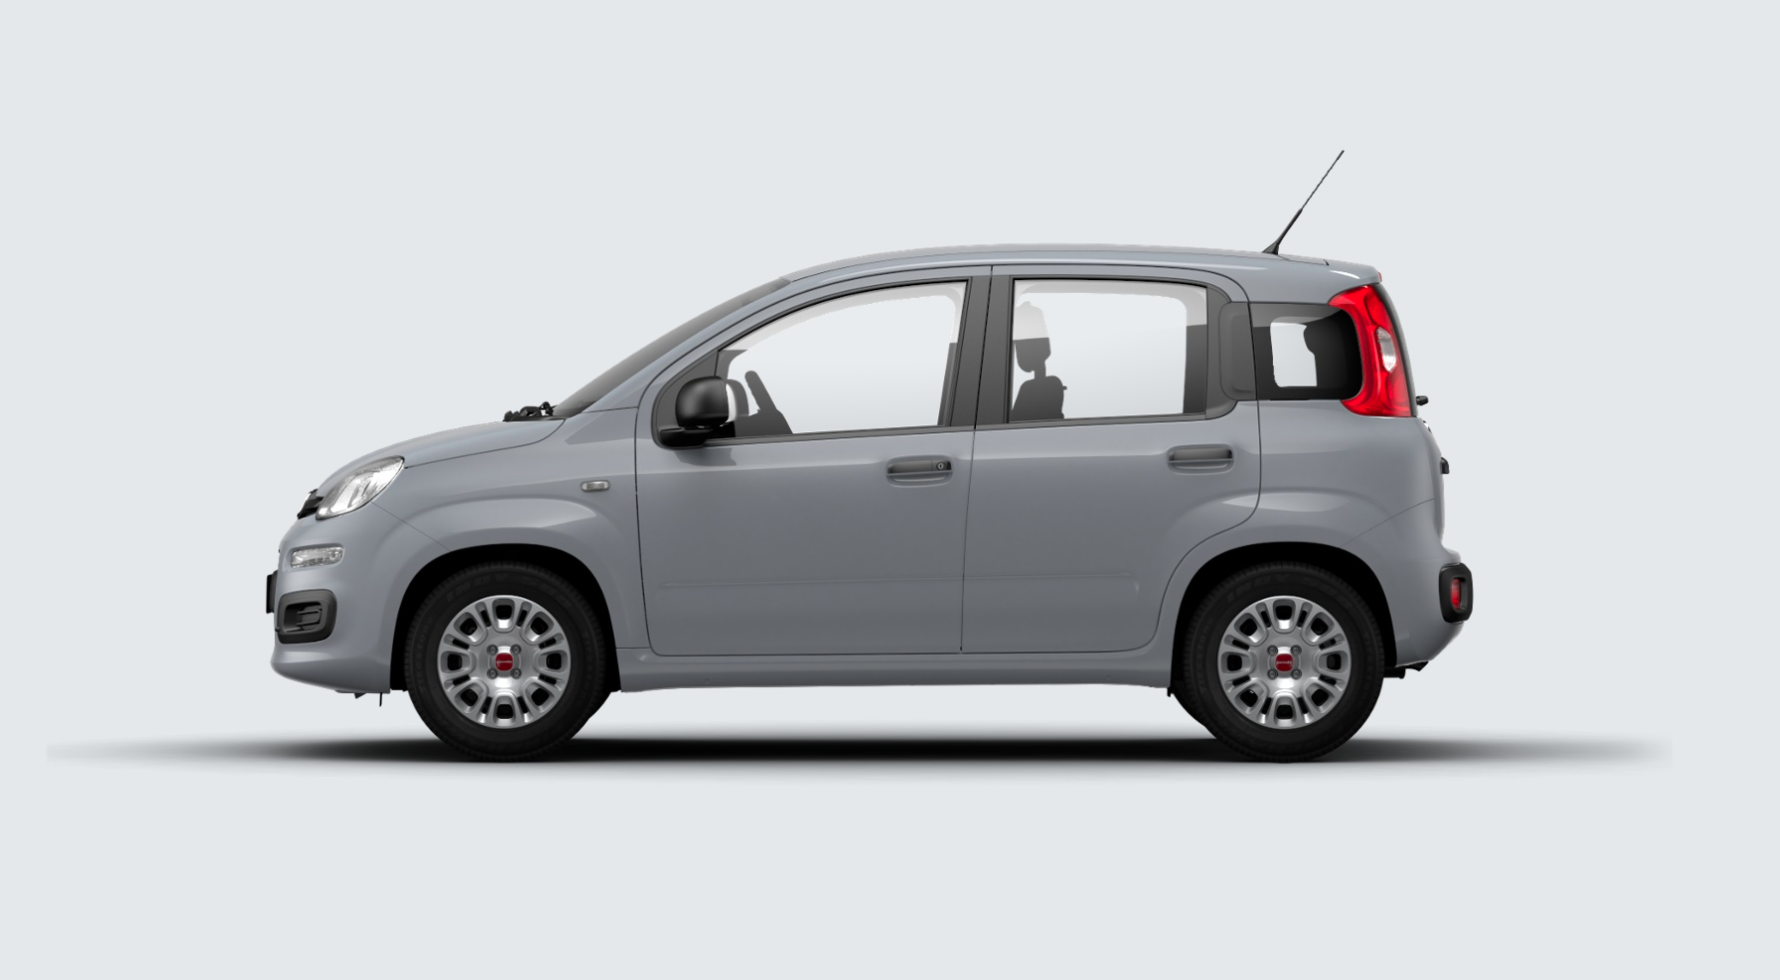 Fiat panda grigio moda km0 a soli 8990 su miacar 1i2si for Fiat panda pop accessori di serie